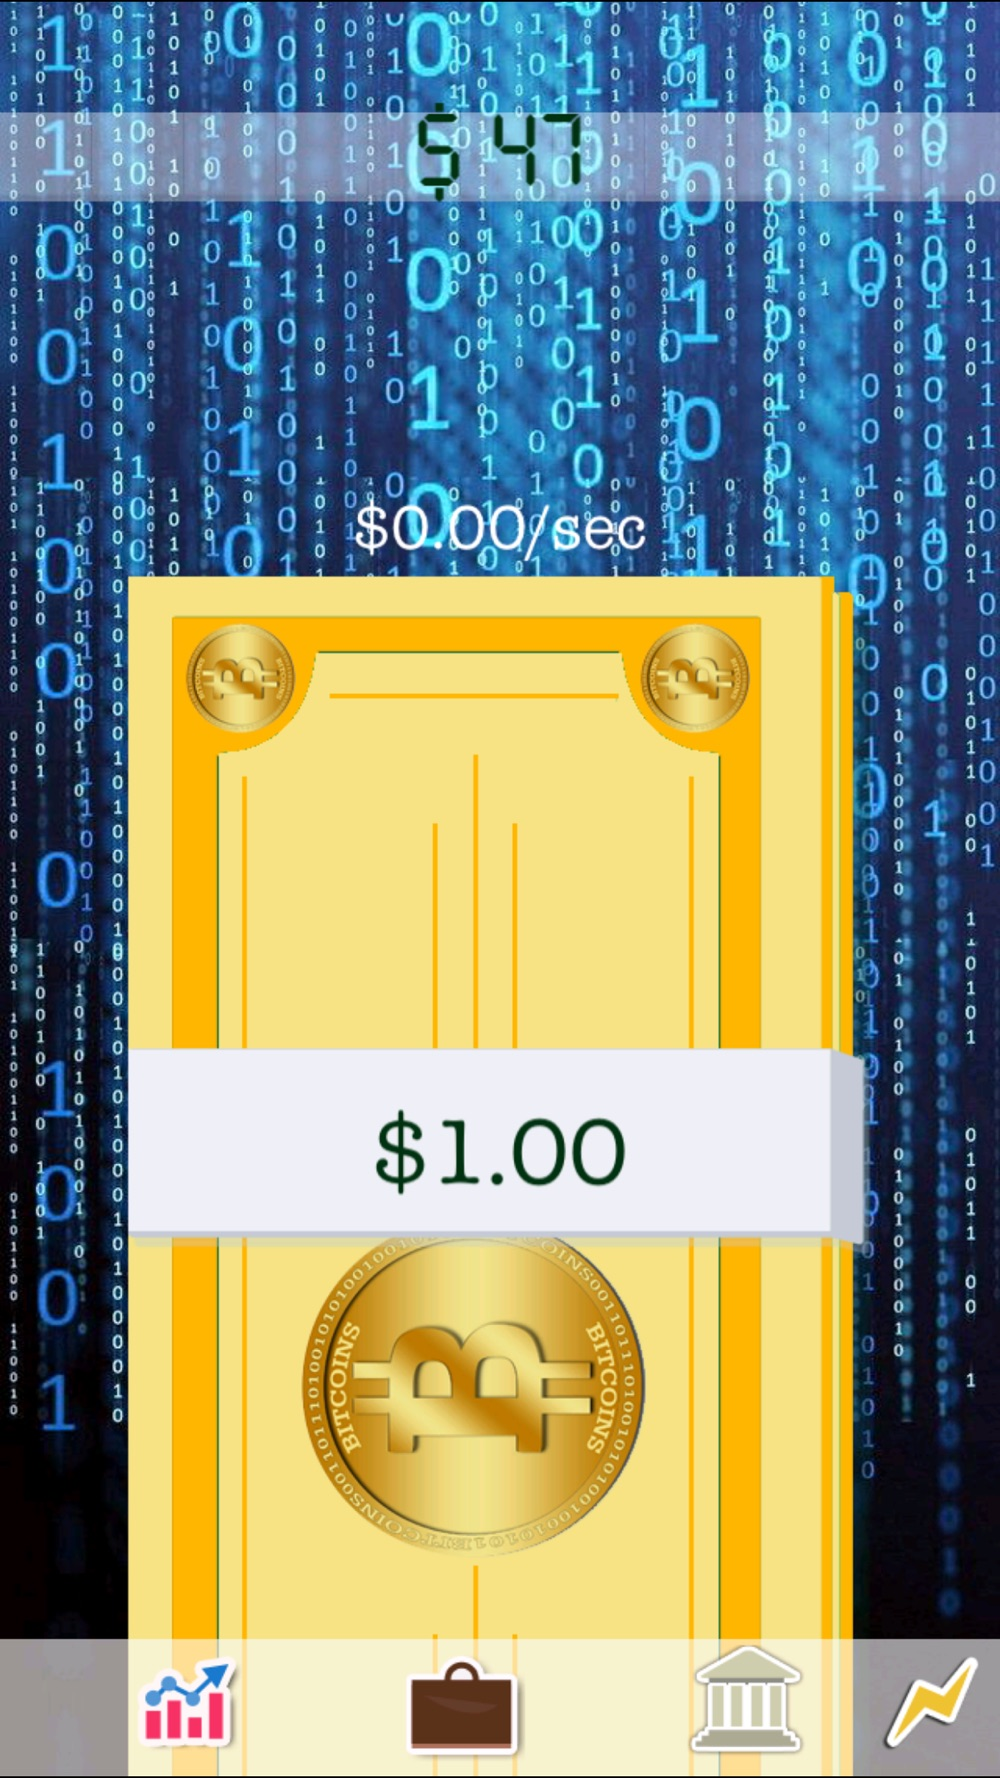 Make it Rain Bitcoins – Become the First Bitcoin Billionaire!